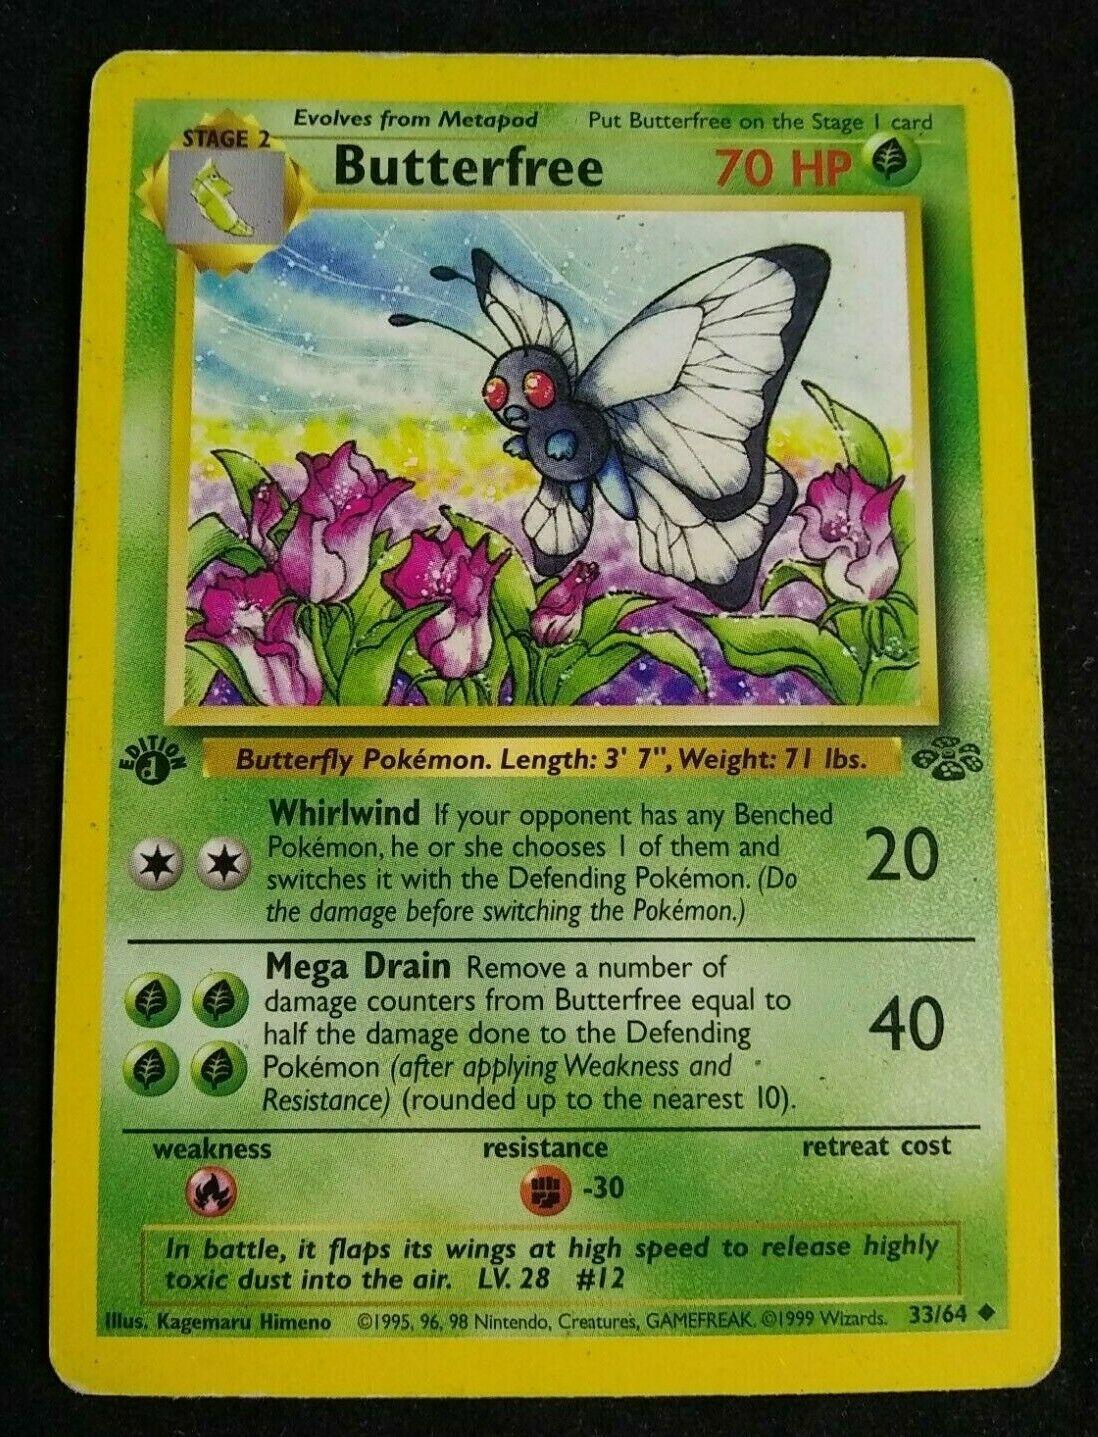 No Persian 42//64 Jungle Wizards Card Details about  /MISPRINT TIE-DYE POKEMON LABEL ERROR